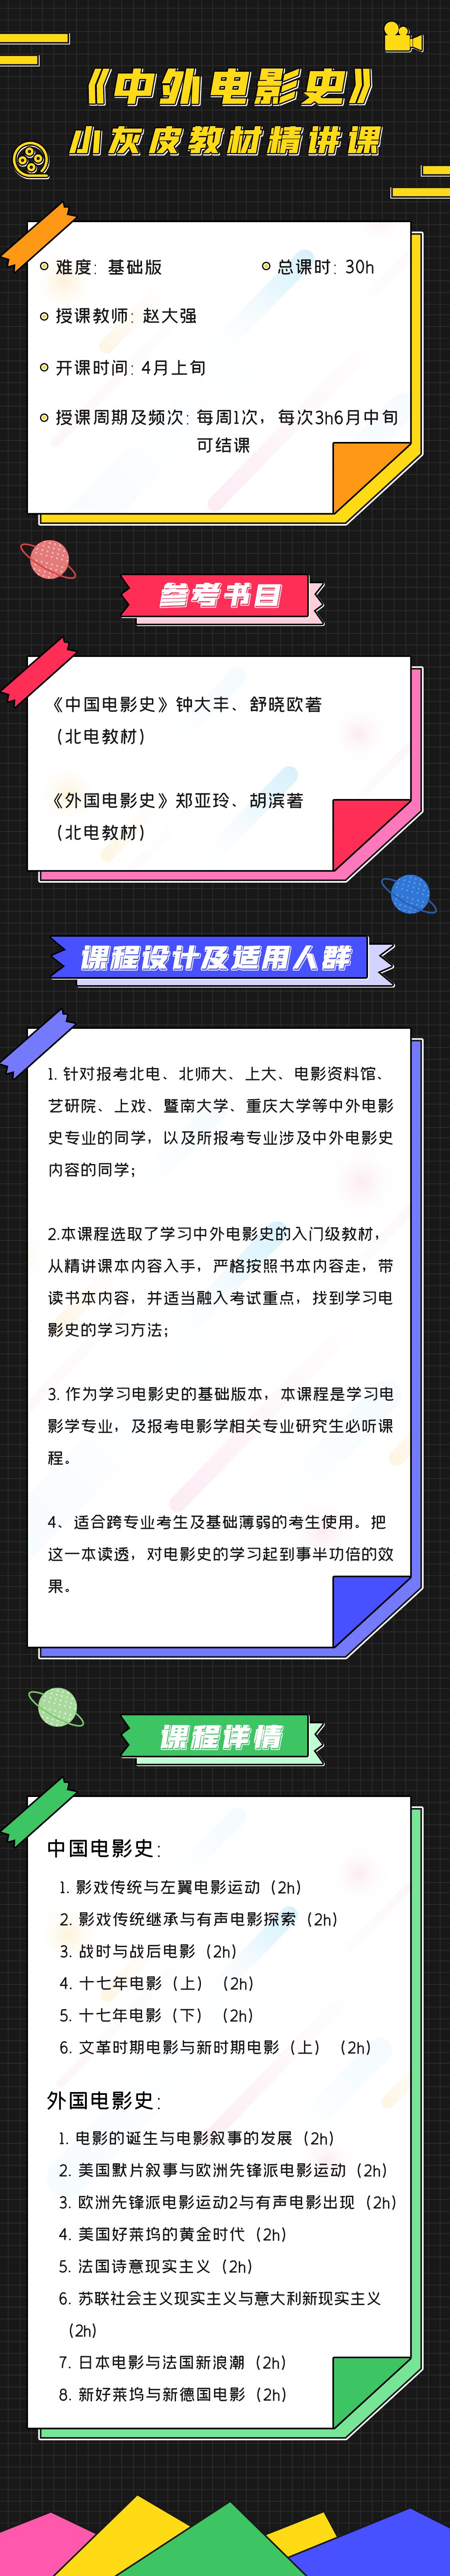 ct1-taobao.png